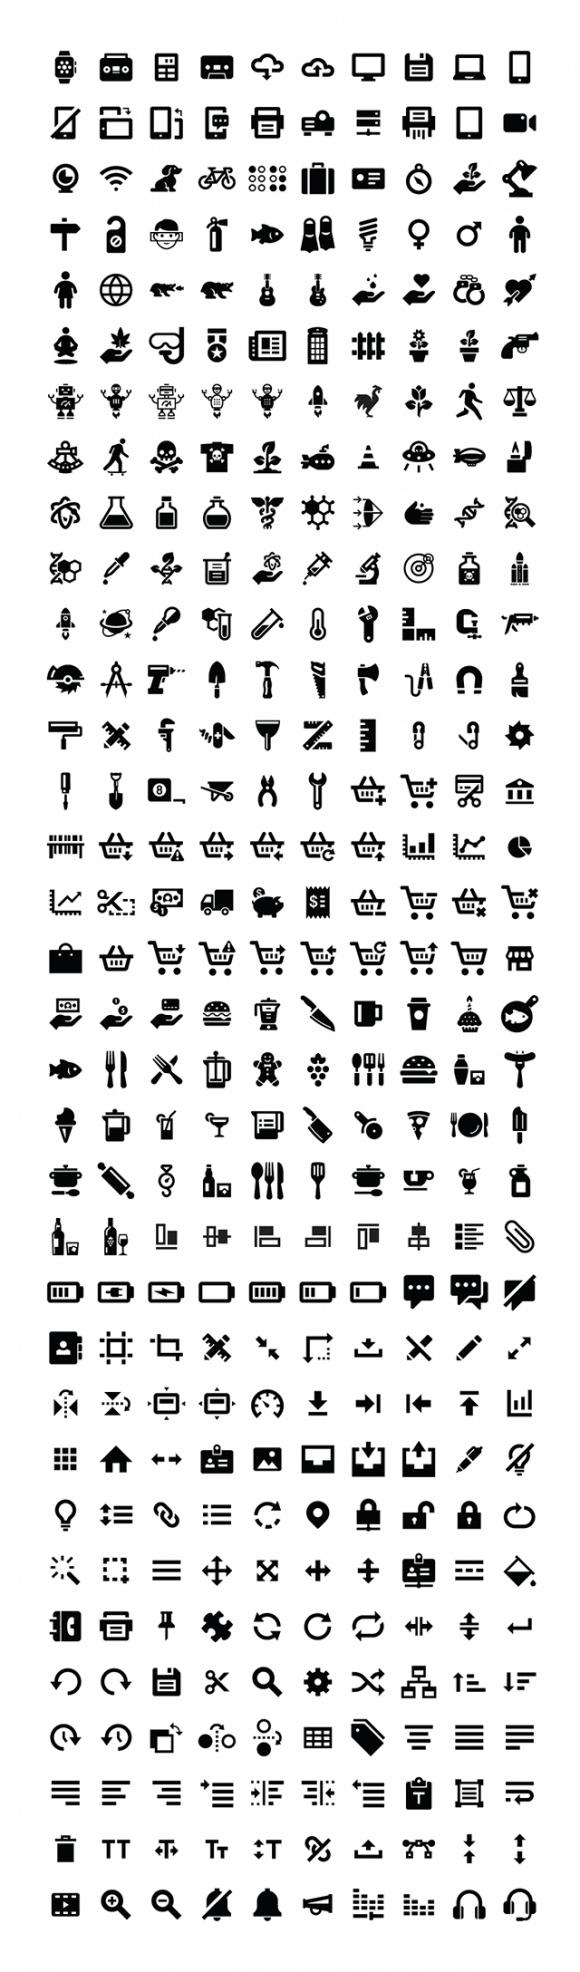 iconify free icons set 1